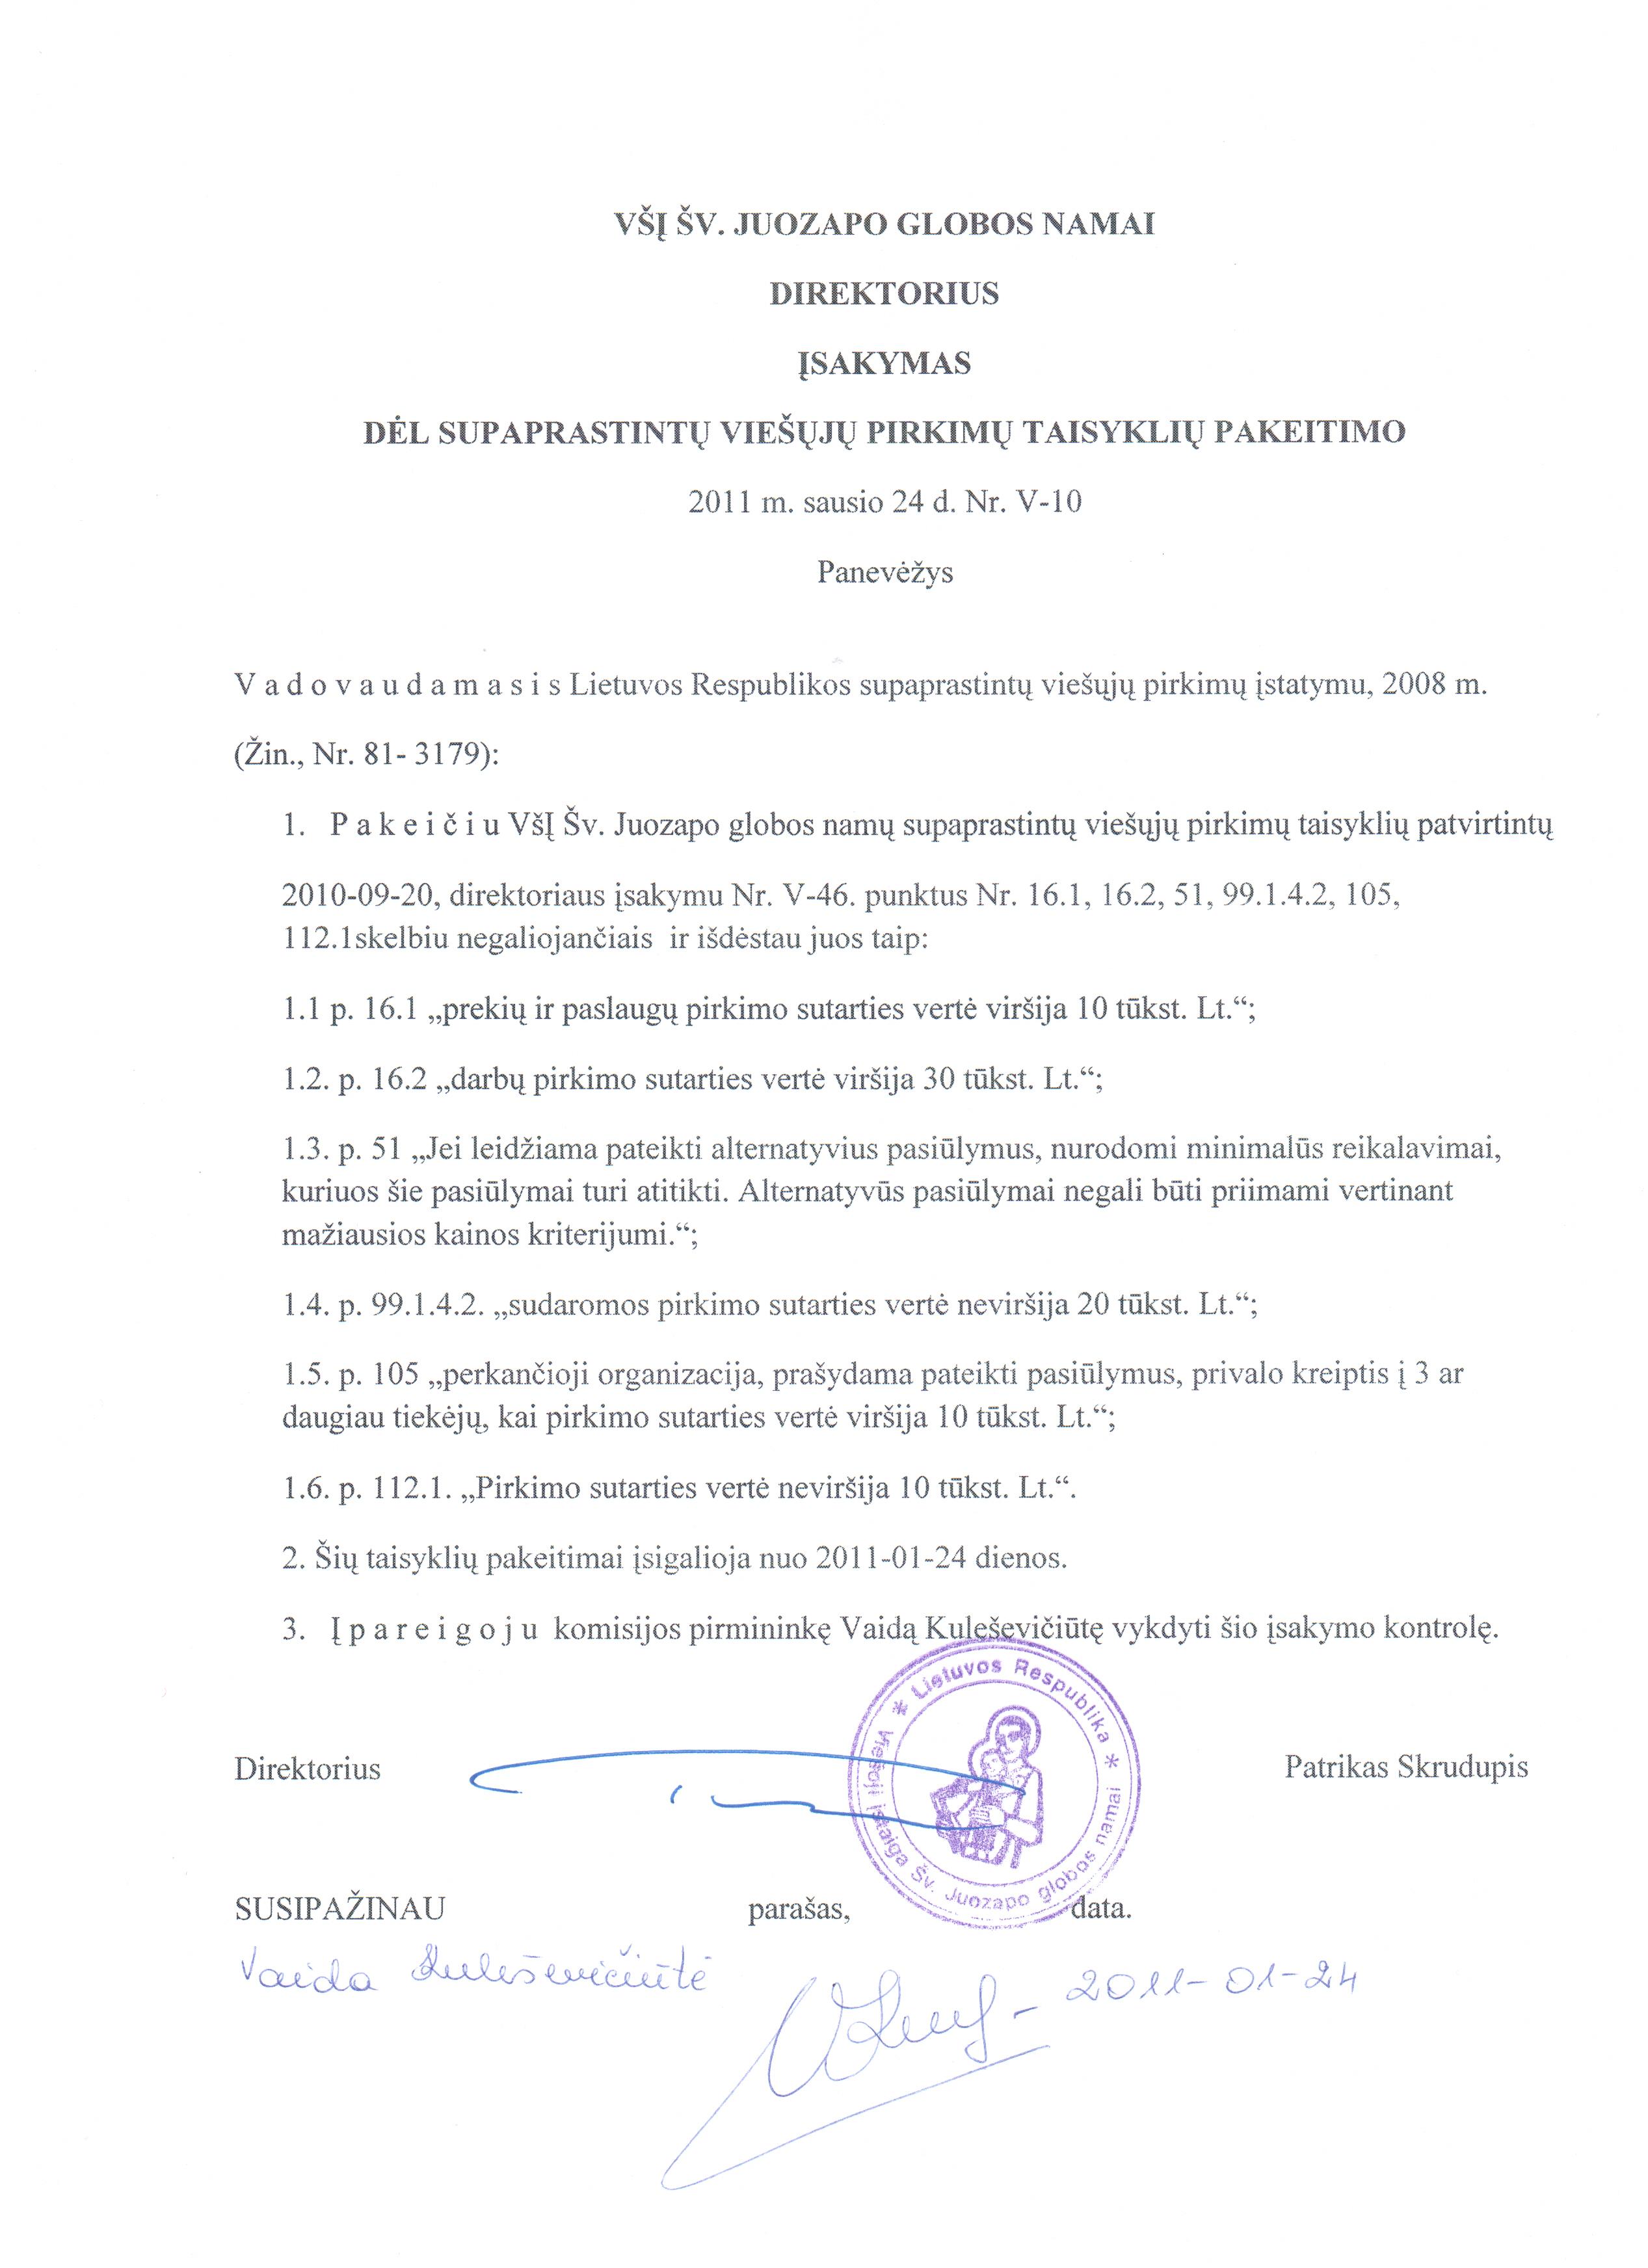 TTMEM - Lithuanian to Romanian European Commission